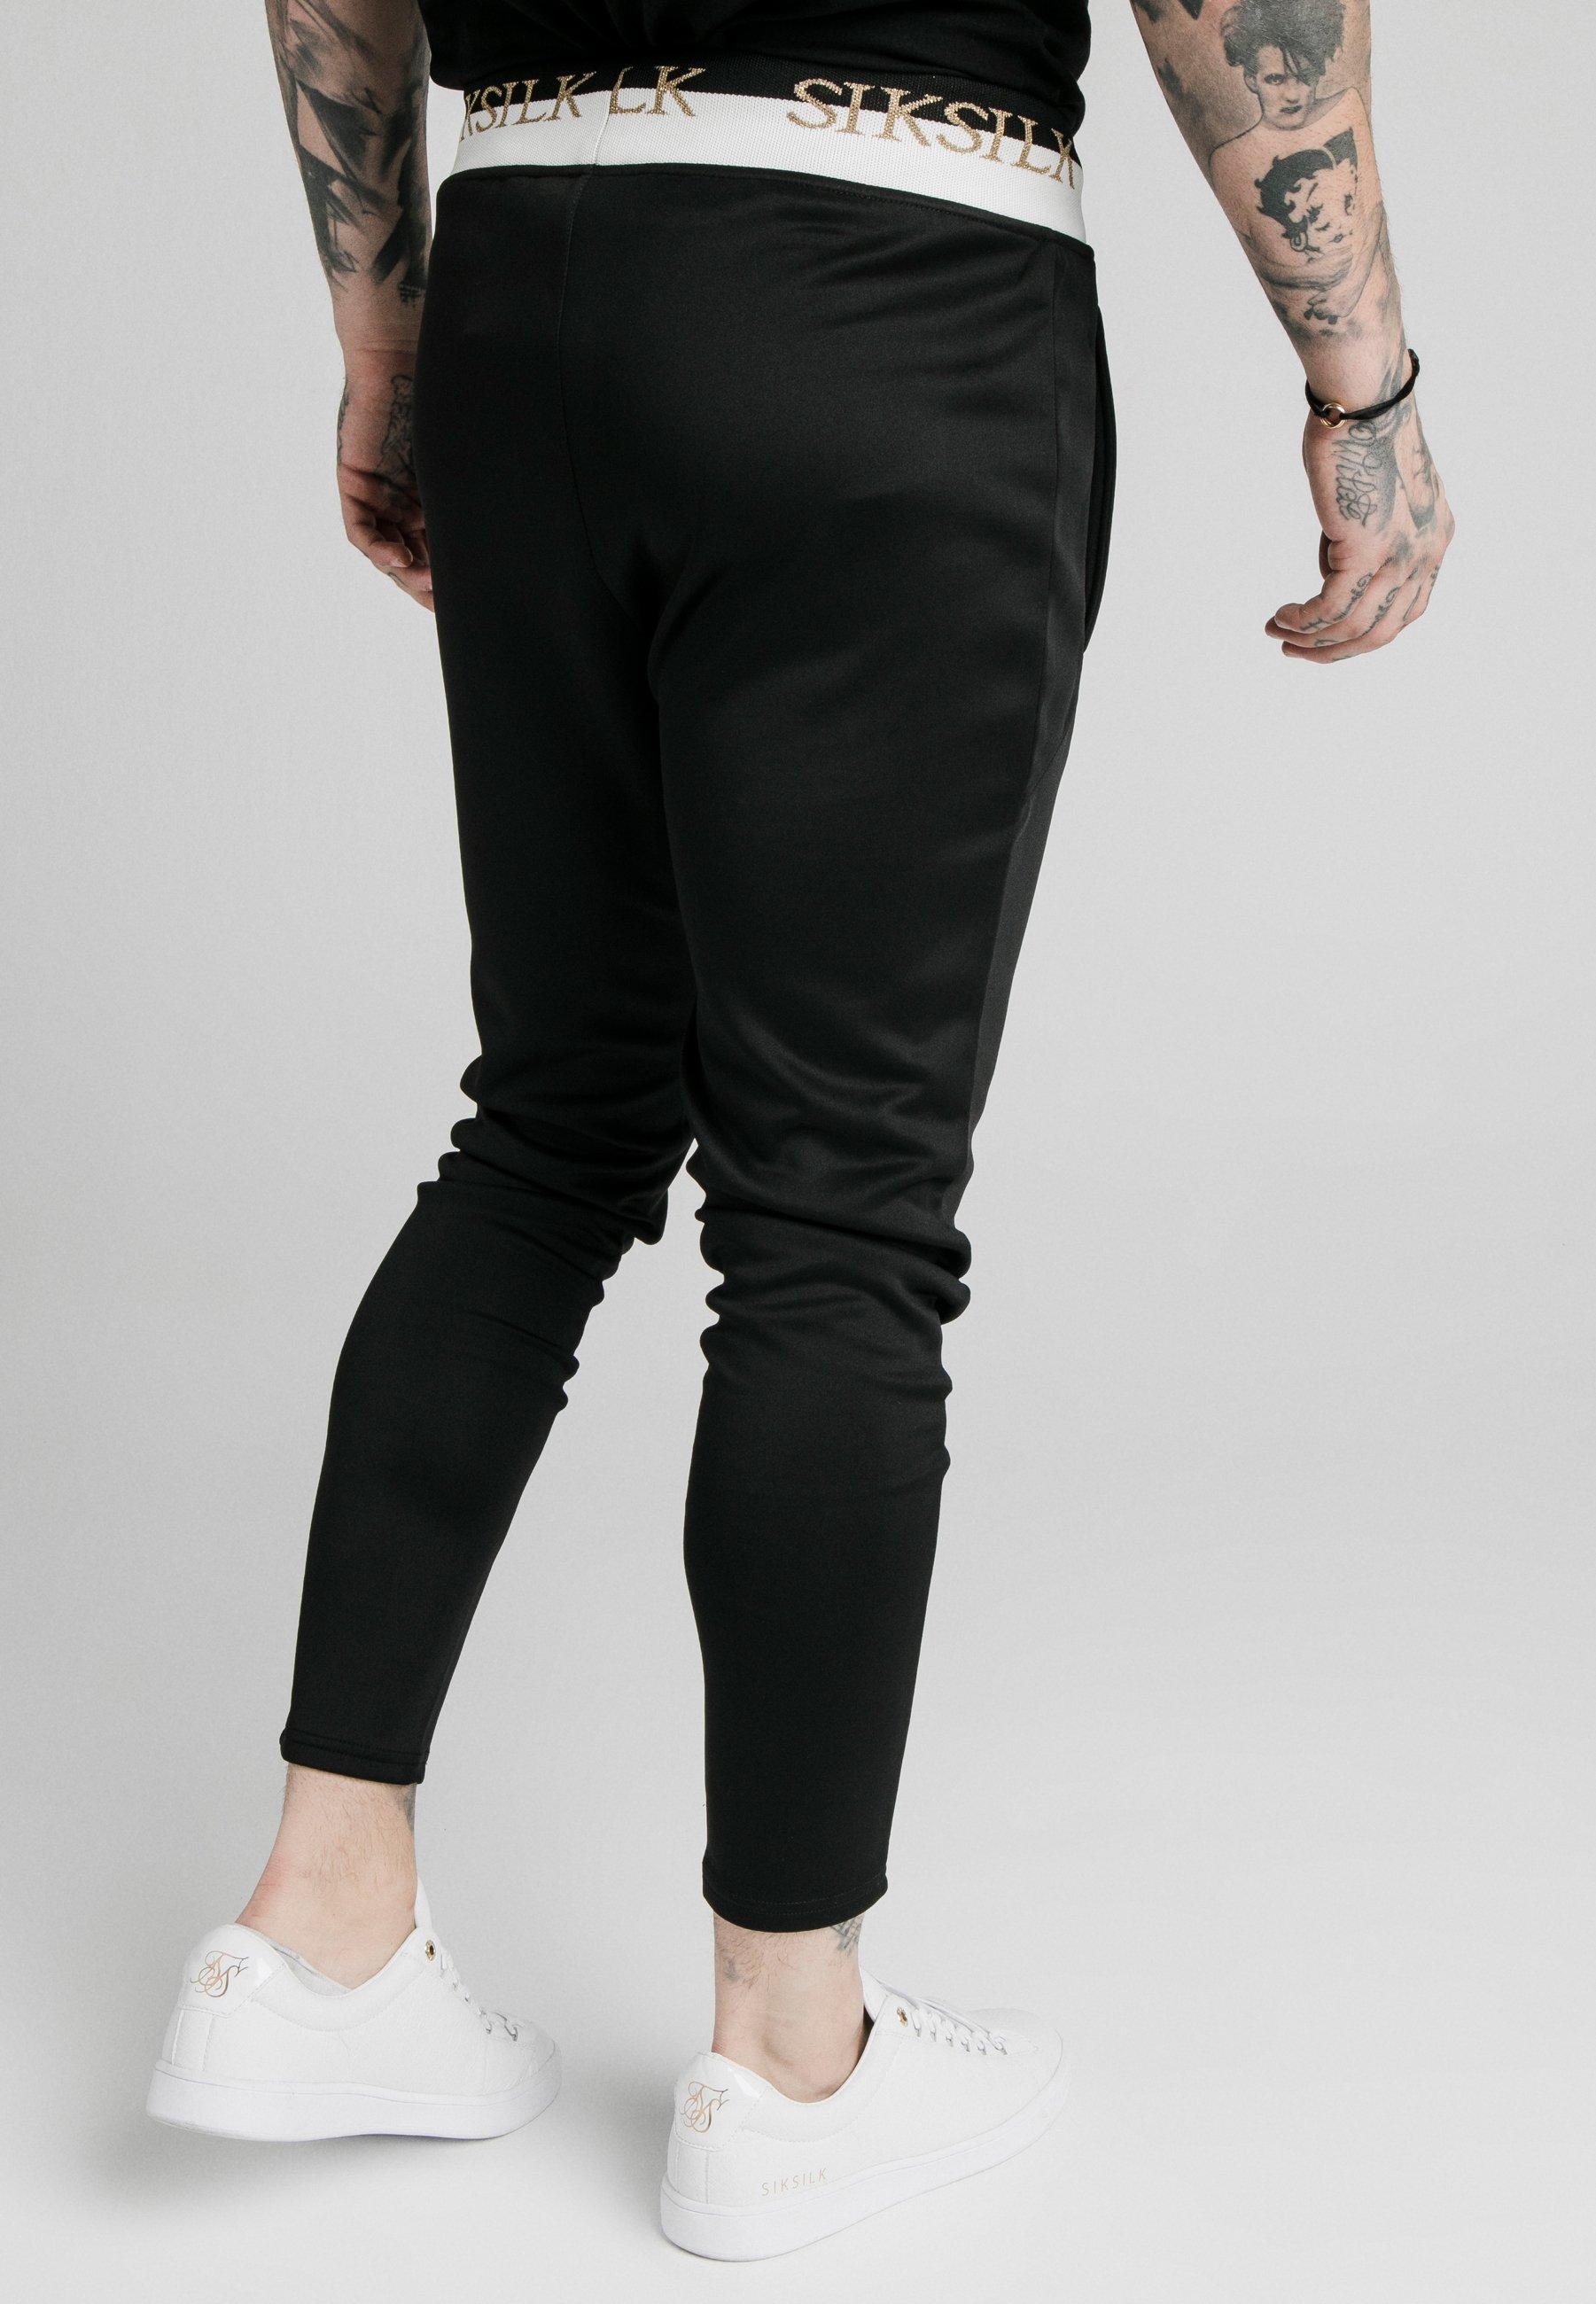 SIK SILK FITTED PANEL TAPE TRACK PANTS – BLACK Klesbutikk